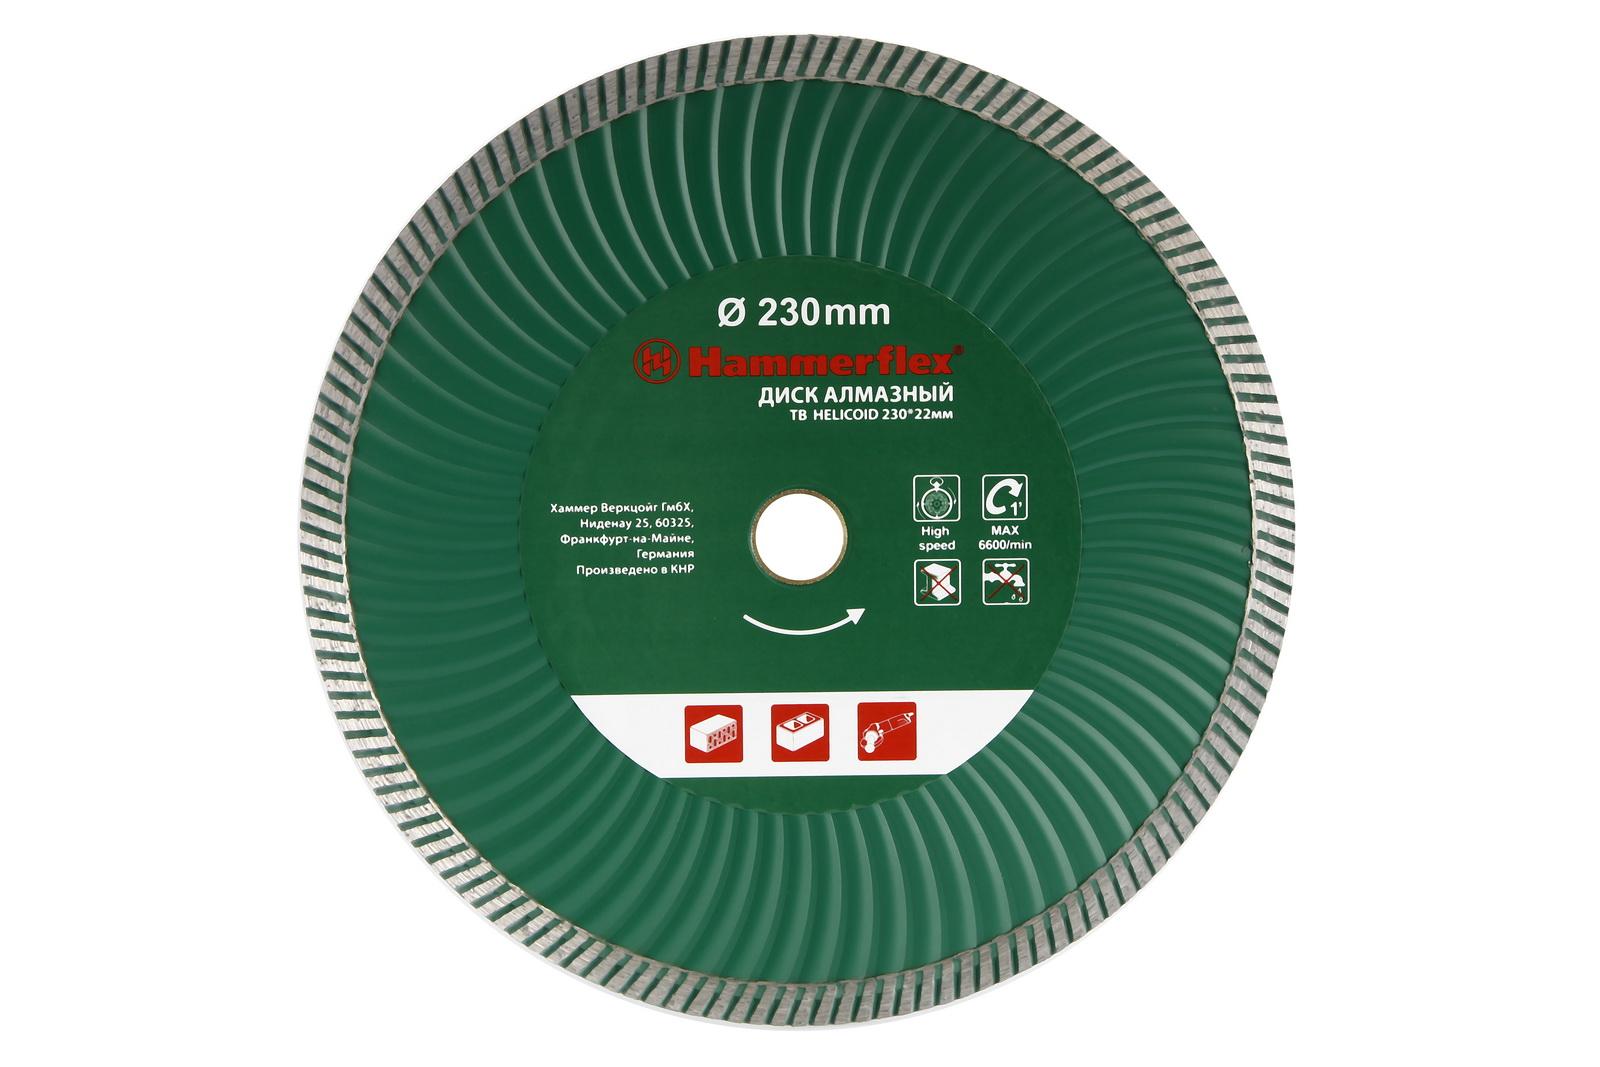 Круг алмазный Hammer 206-140 db tb helicoid диск алмазный diam 150х22 2мм master турбо 000160